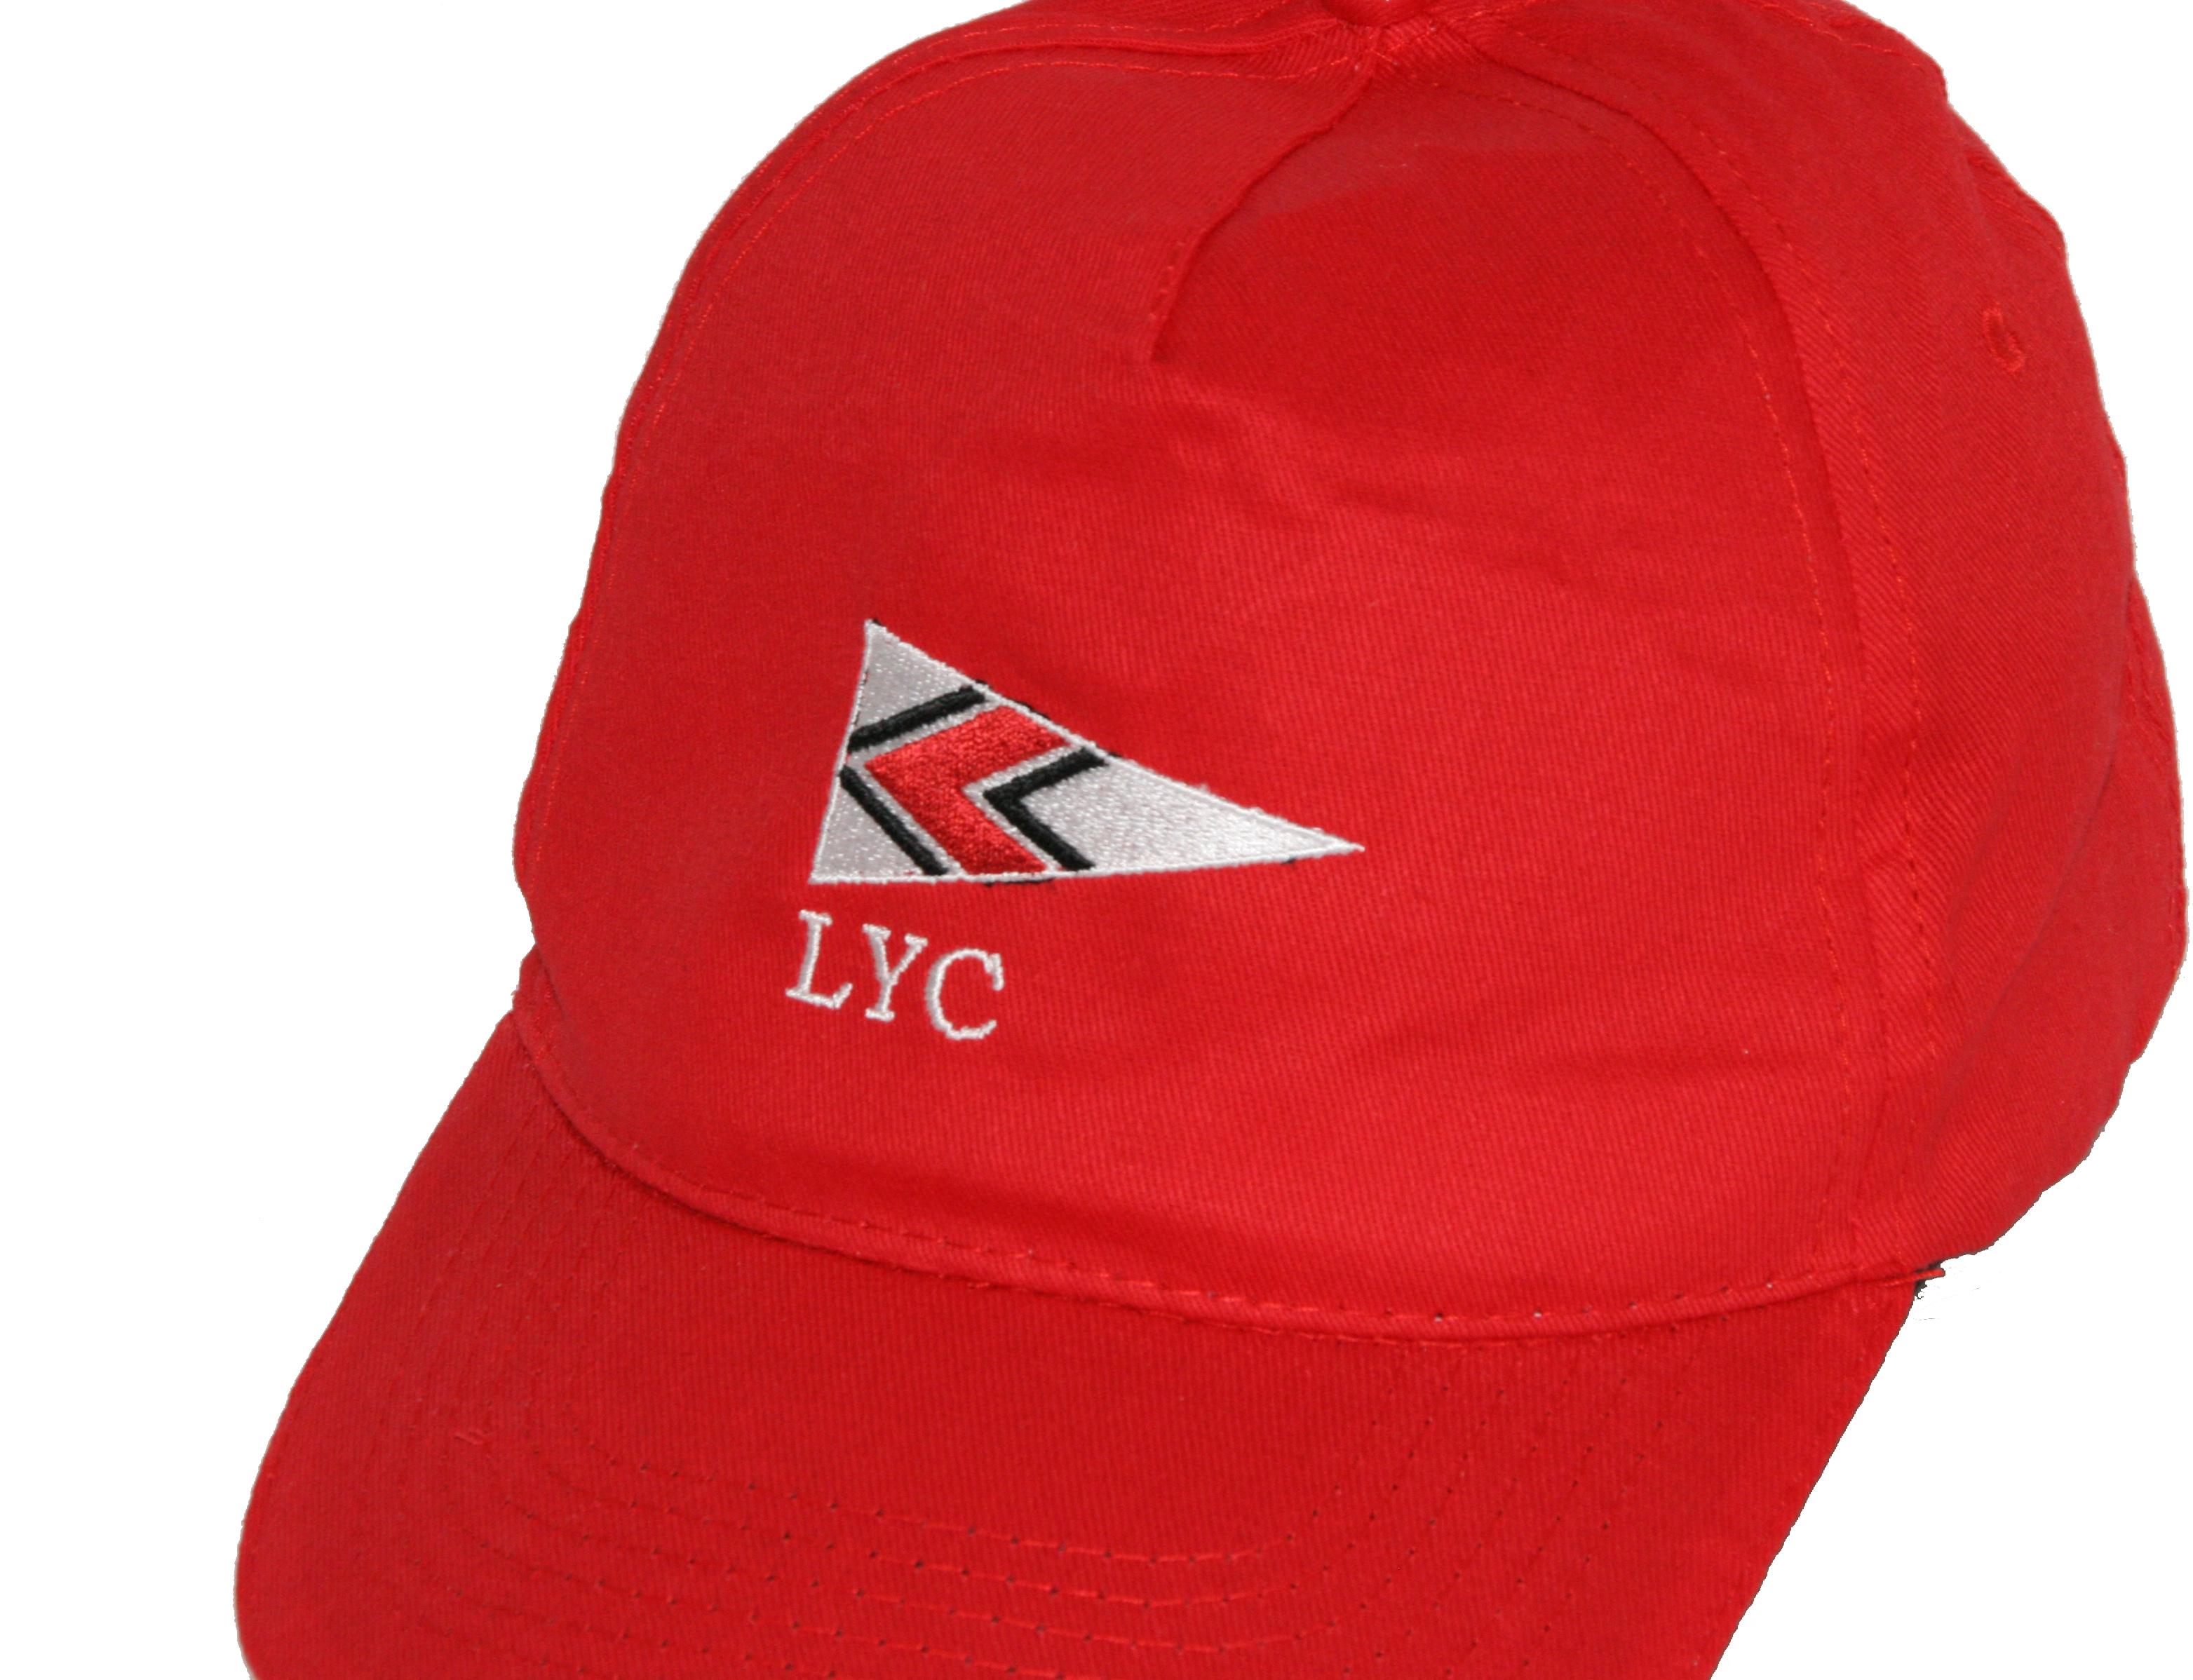 Basecap | Kinder | Stirn mit LYC-Logo | (c) Mike Gahn